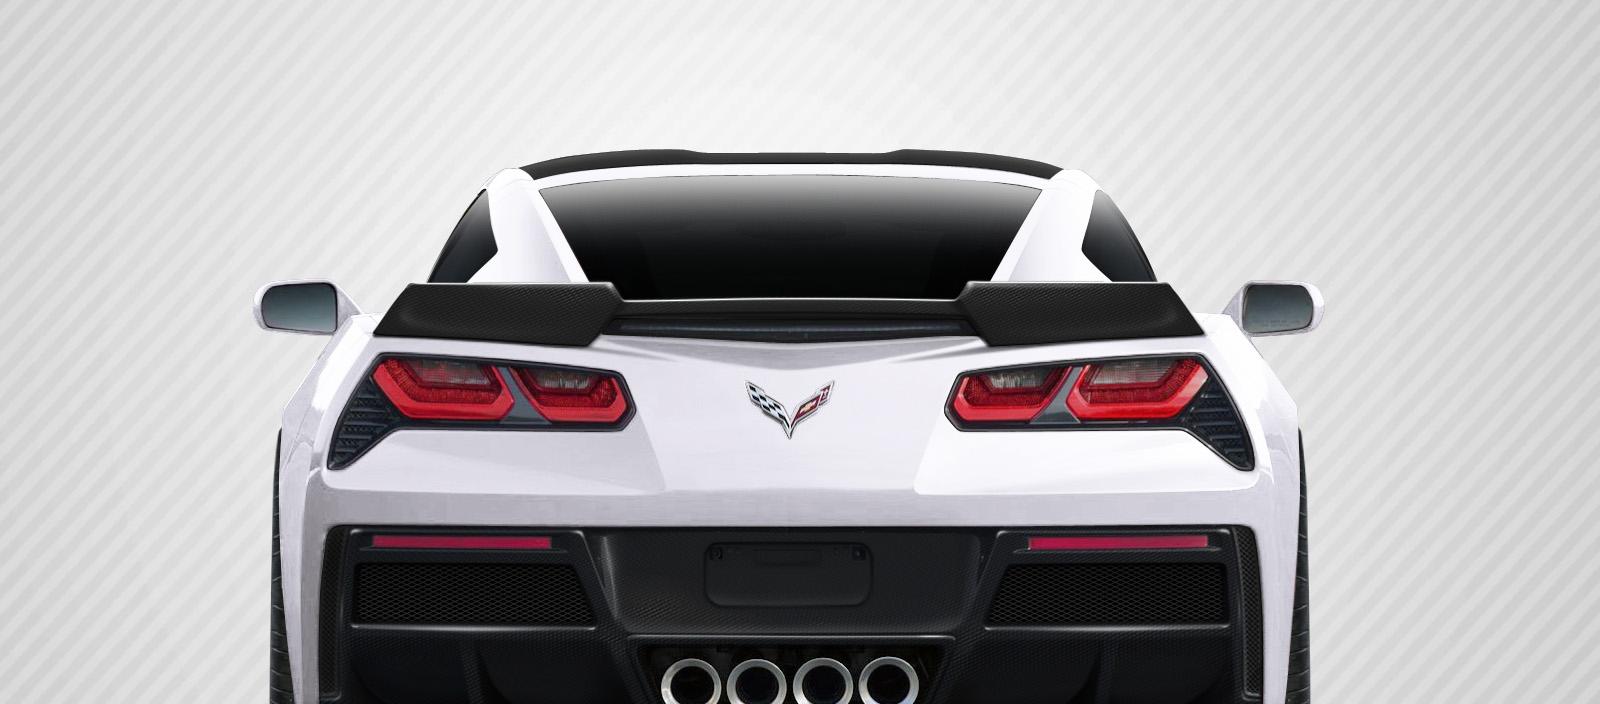 2016 Chevrolet Corvette ALL Wing Spoiler Bodykit - Chevrolet Corvette C7 Carbon Creations Gran Veloce Wing- 1 Piece